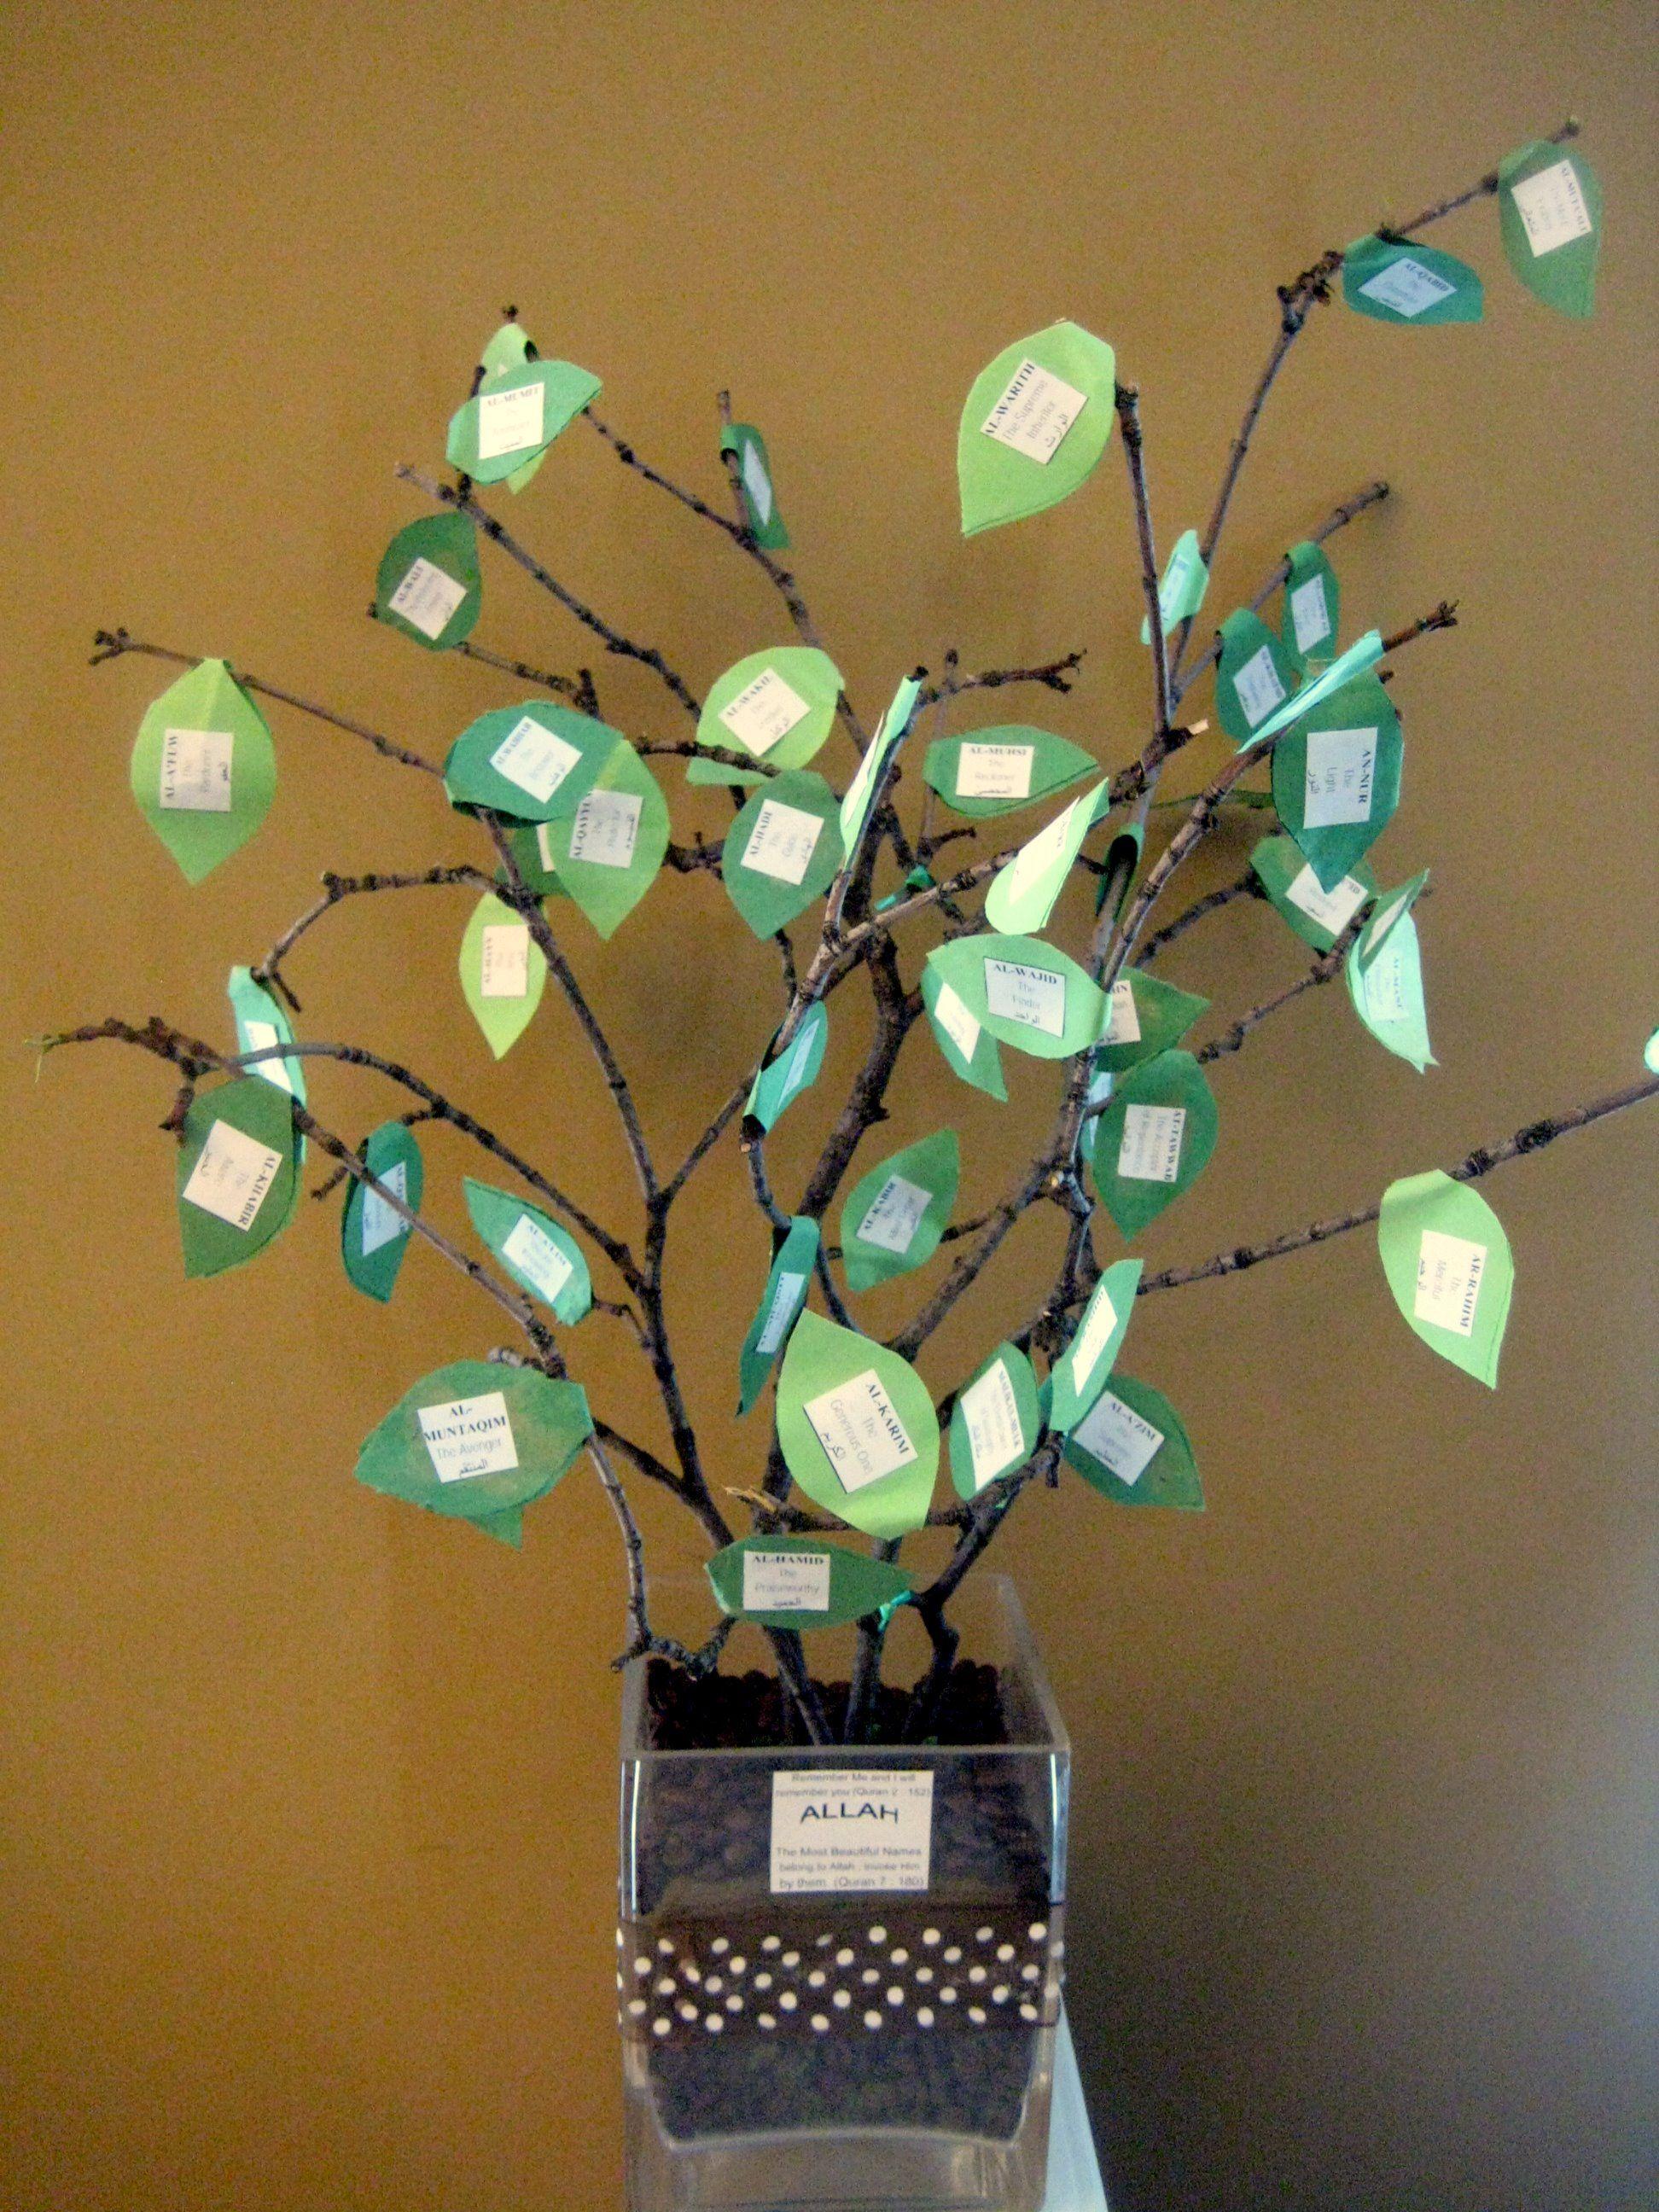 99 names of Allah tree 99 names